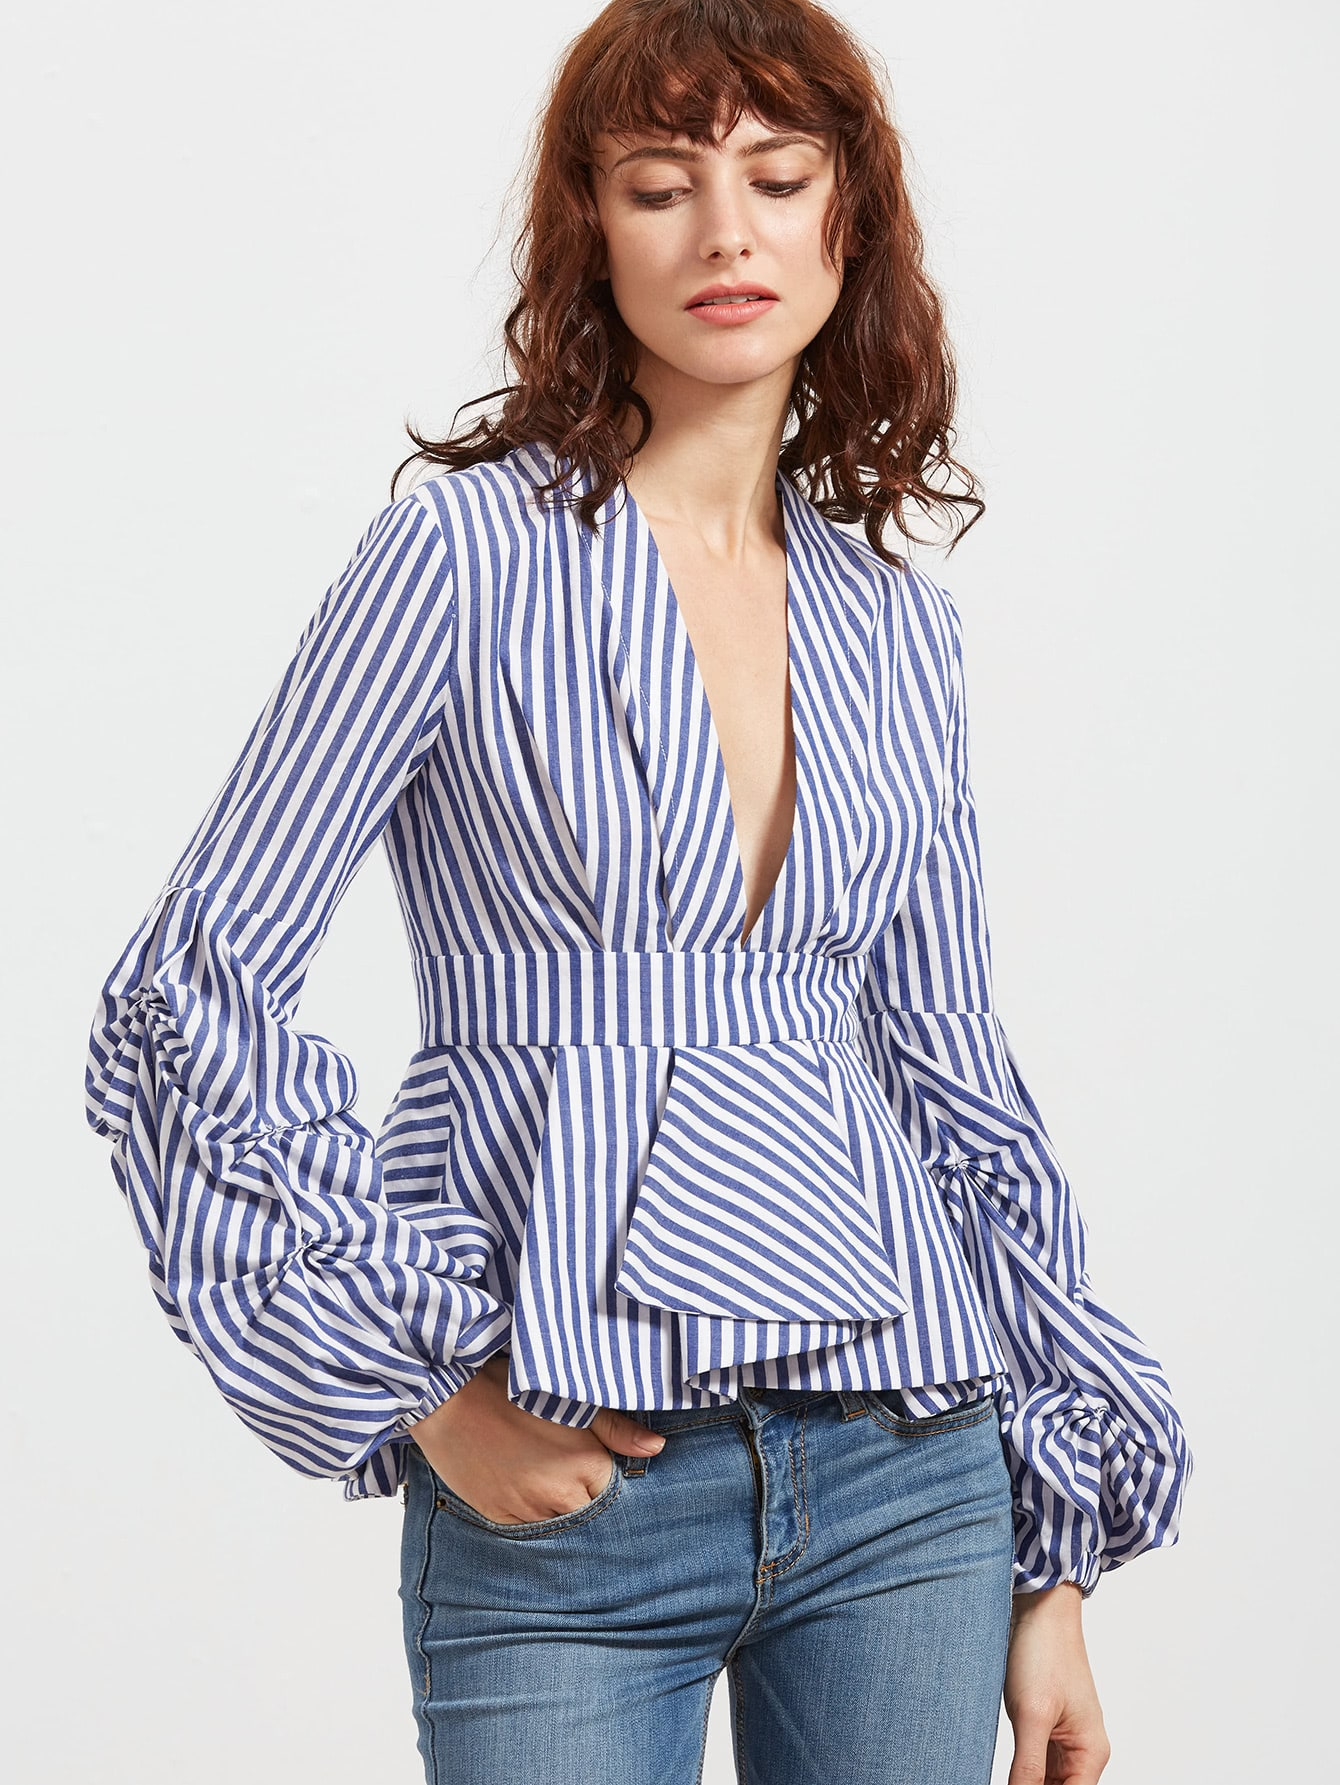 blouse170104701_2